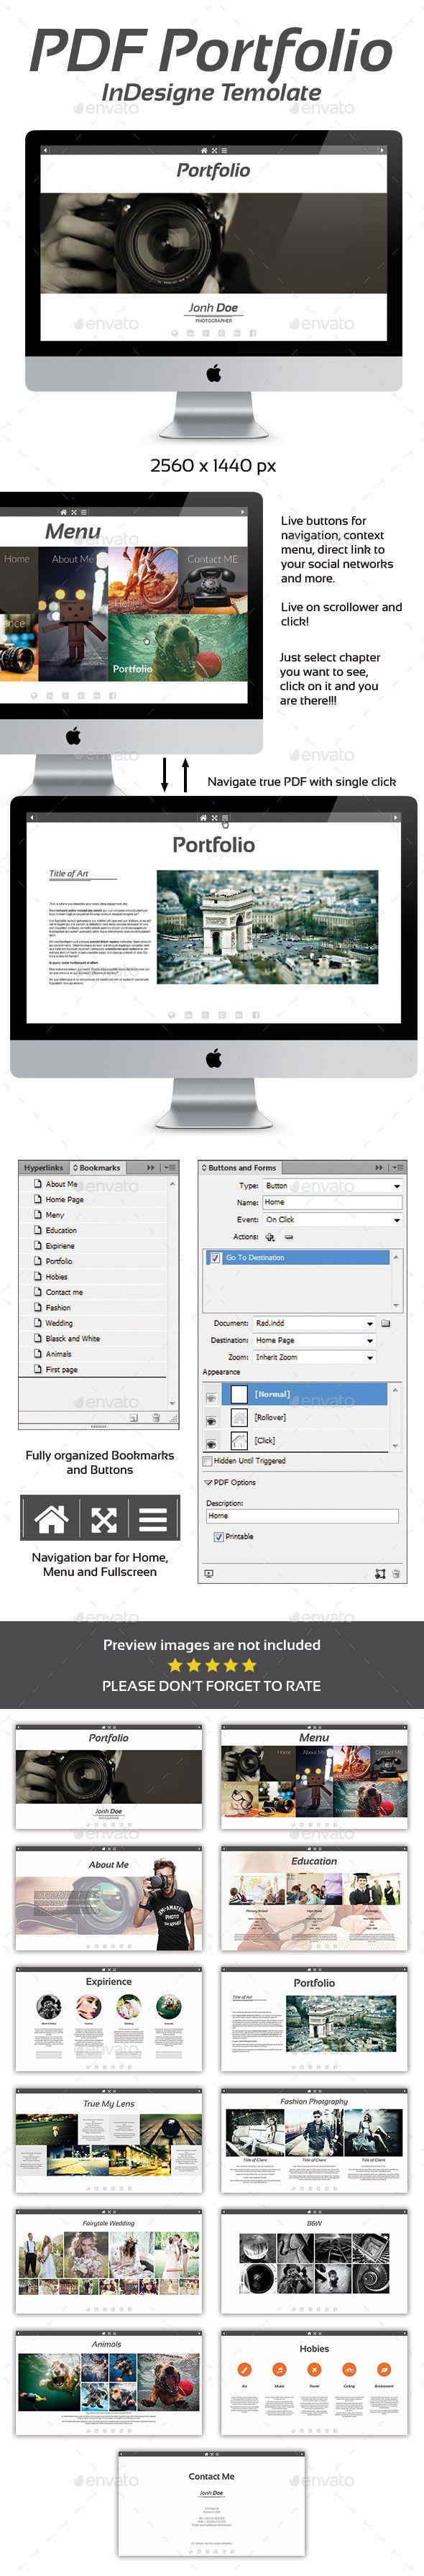 interactive pdf prezentation 2560x1440 template  design download       graphicriver net  item